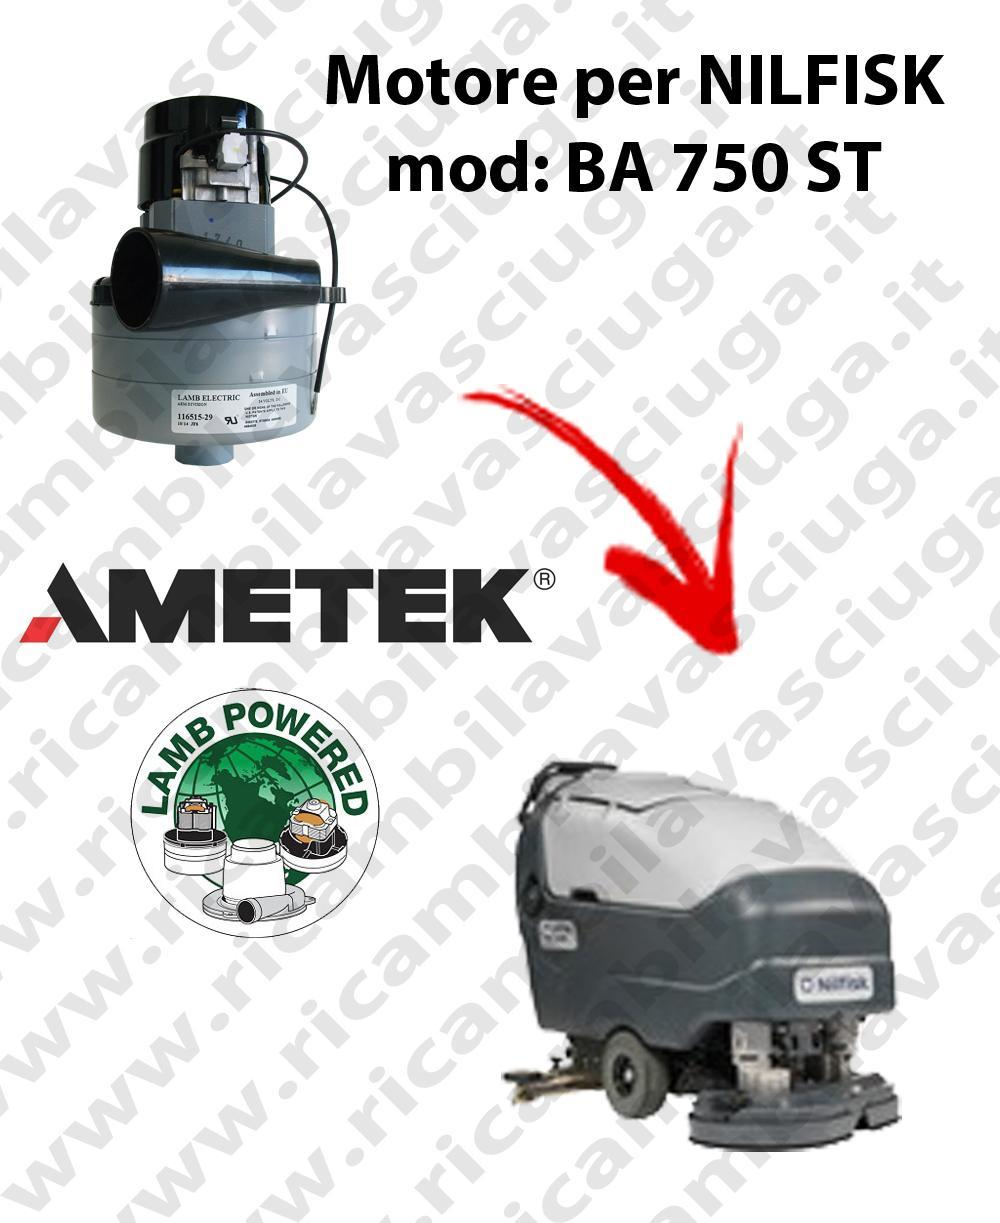 BA 750 ST Saugmotor LAMB AMETEK für scheuersaugmaschinen NILFISK